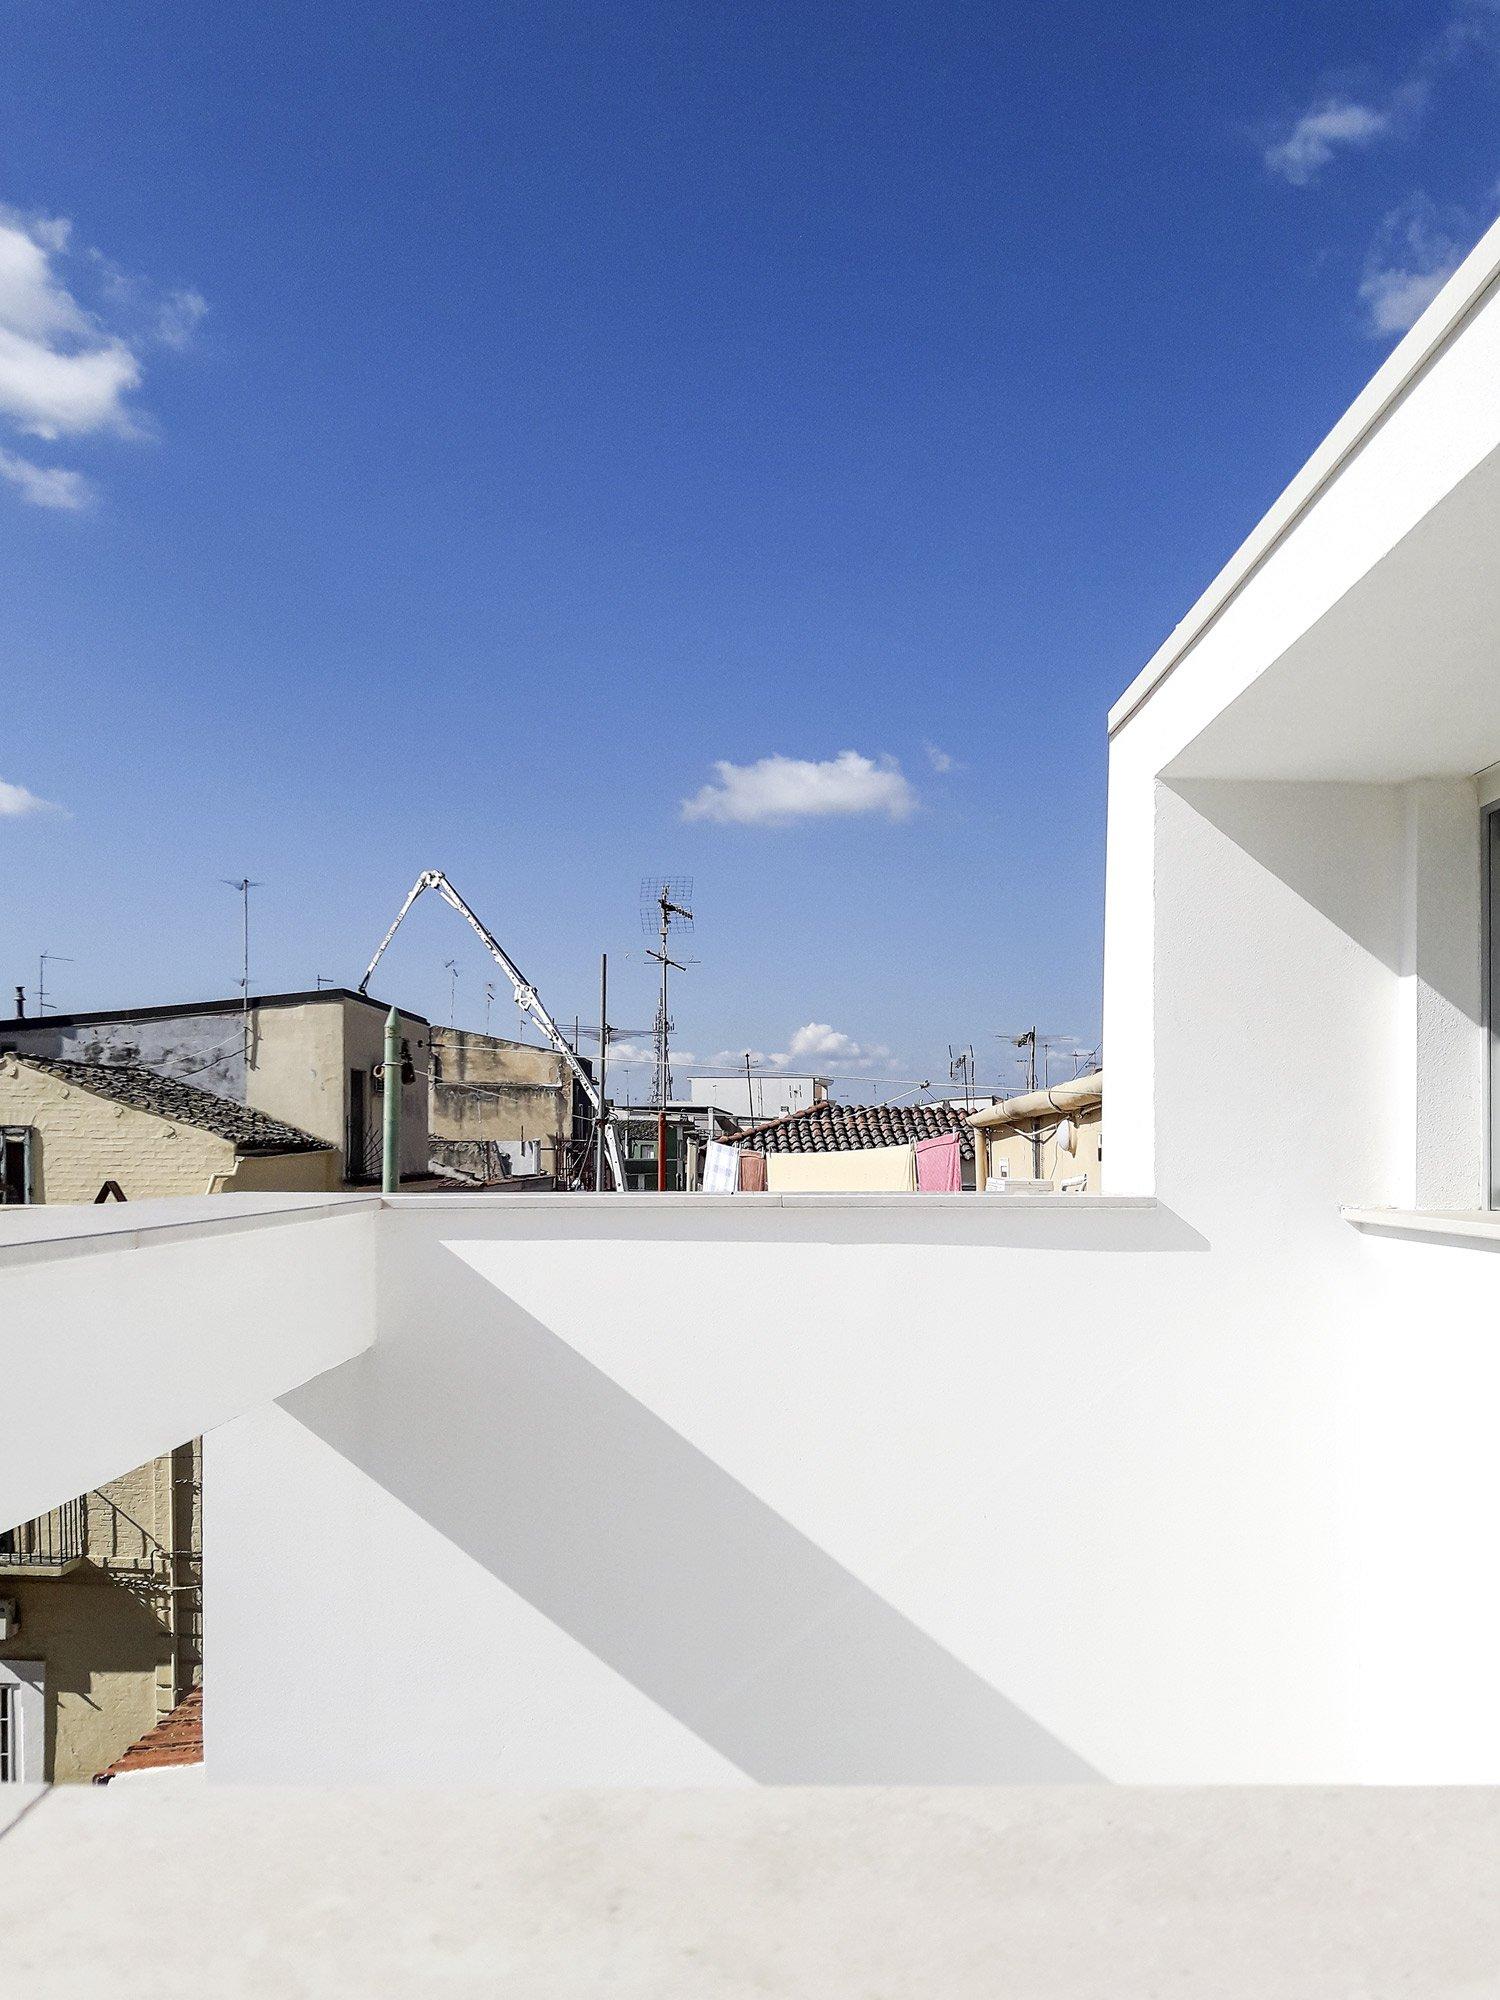 Casa d'angolo, Raimondo Guidacci © Beppe Giardino, courtesy Raimondo Guidacci